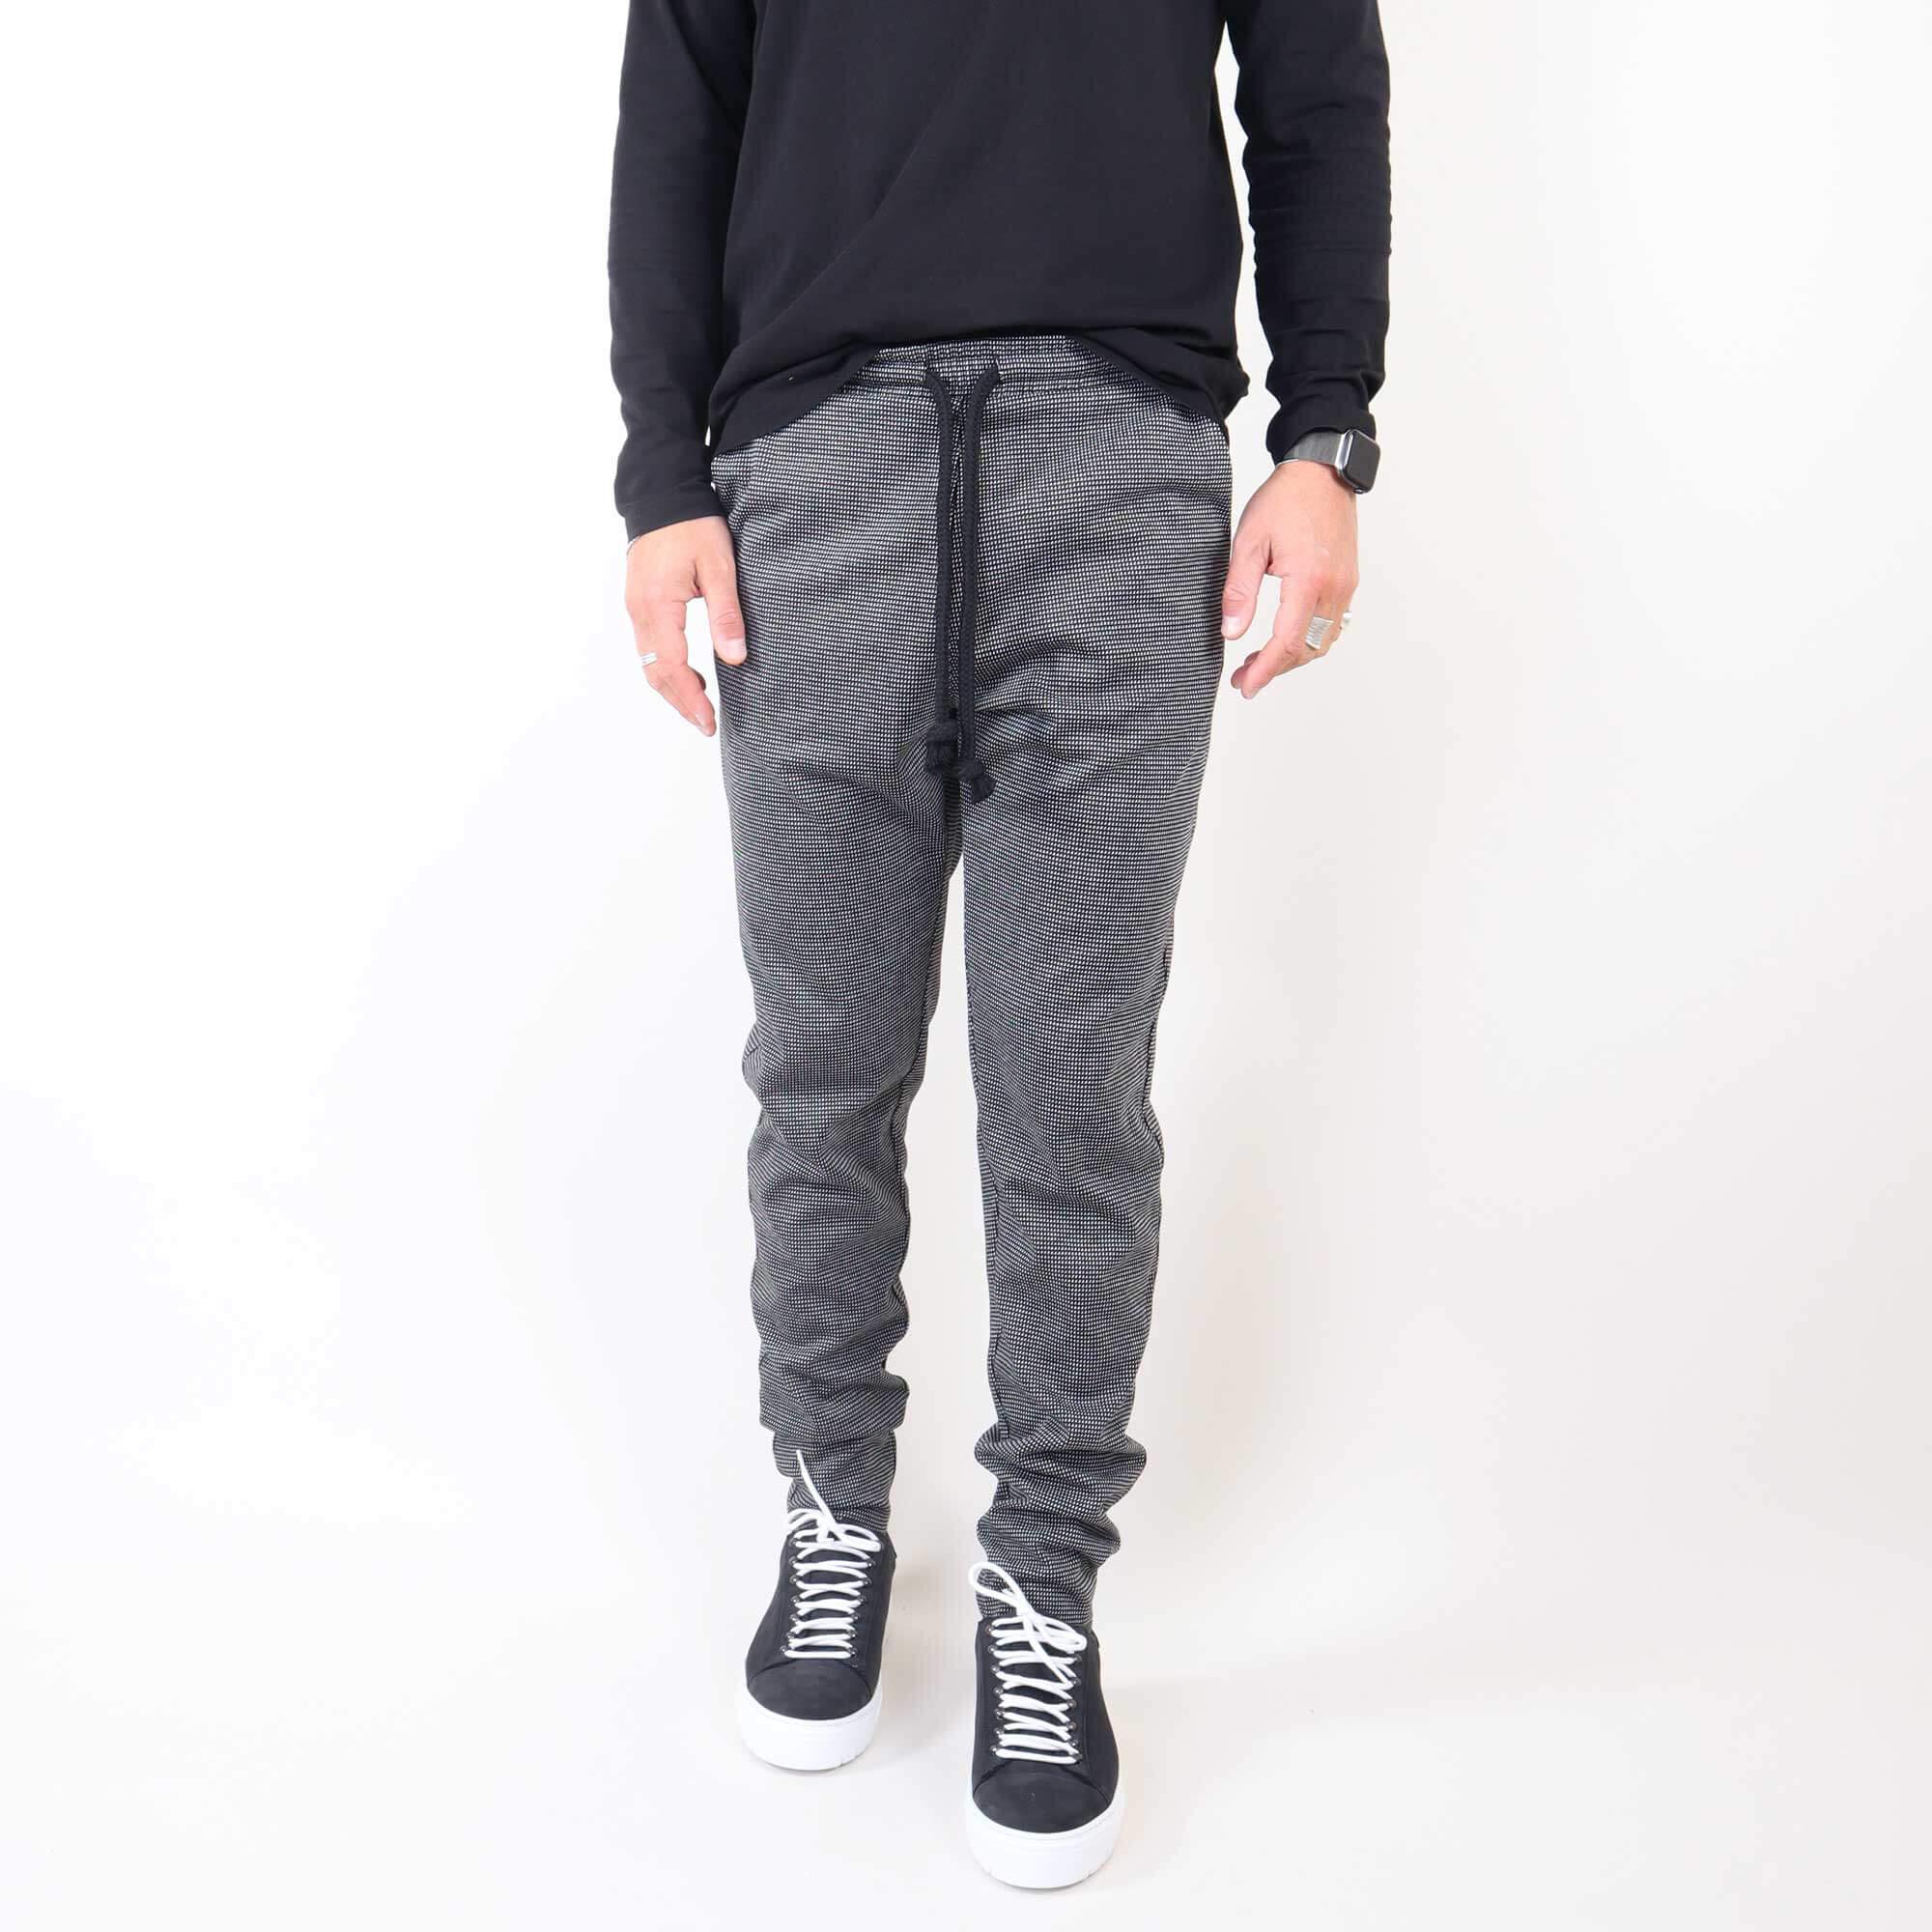 jacquard-blackwhite-1